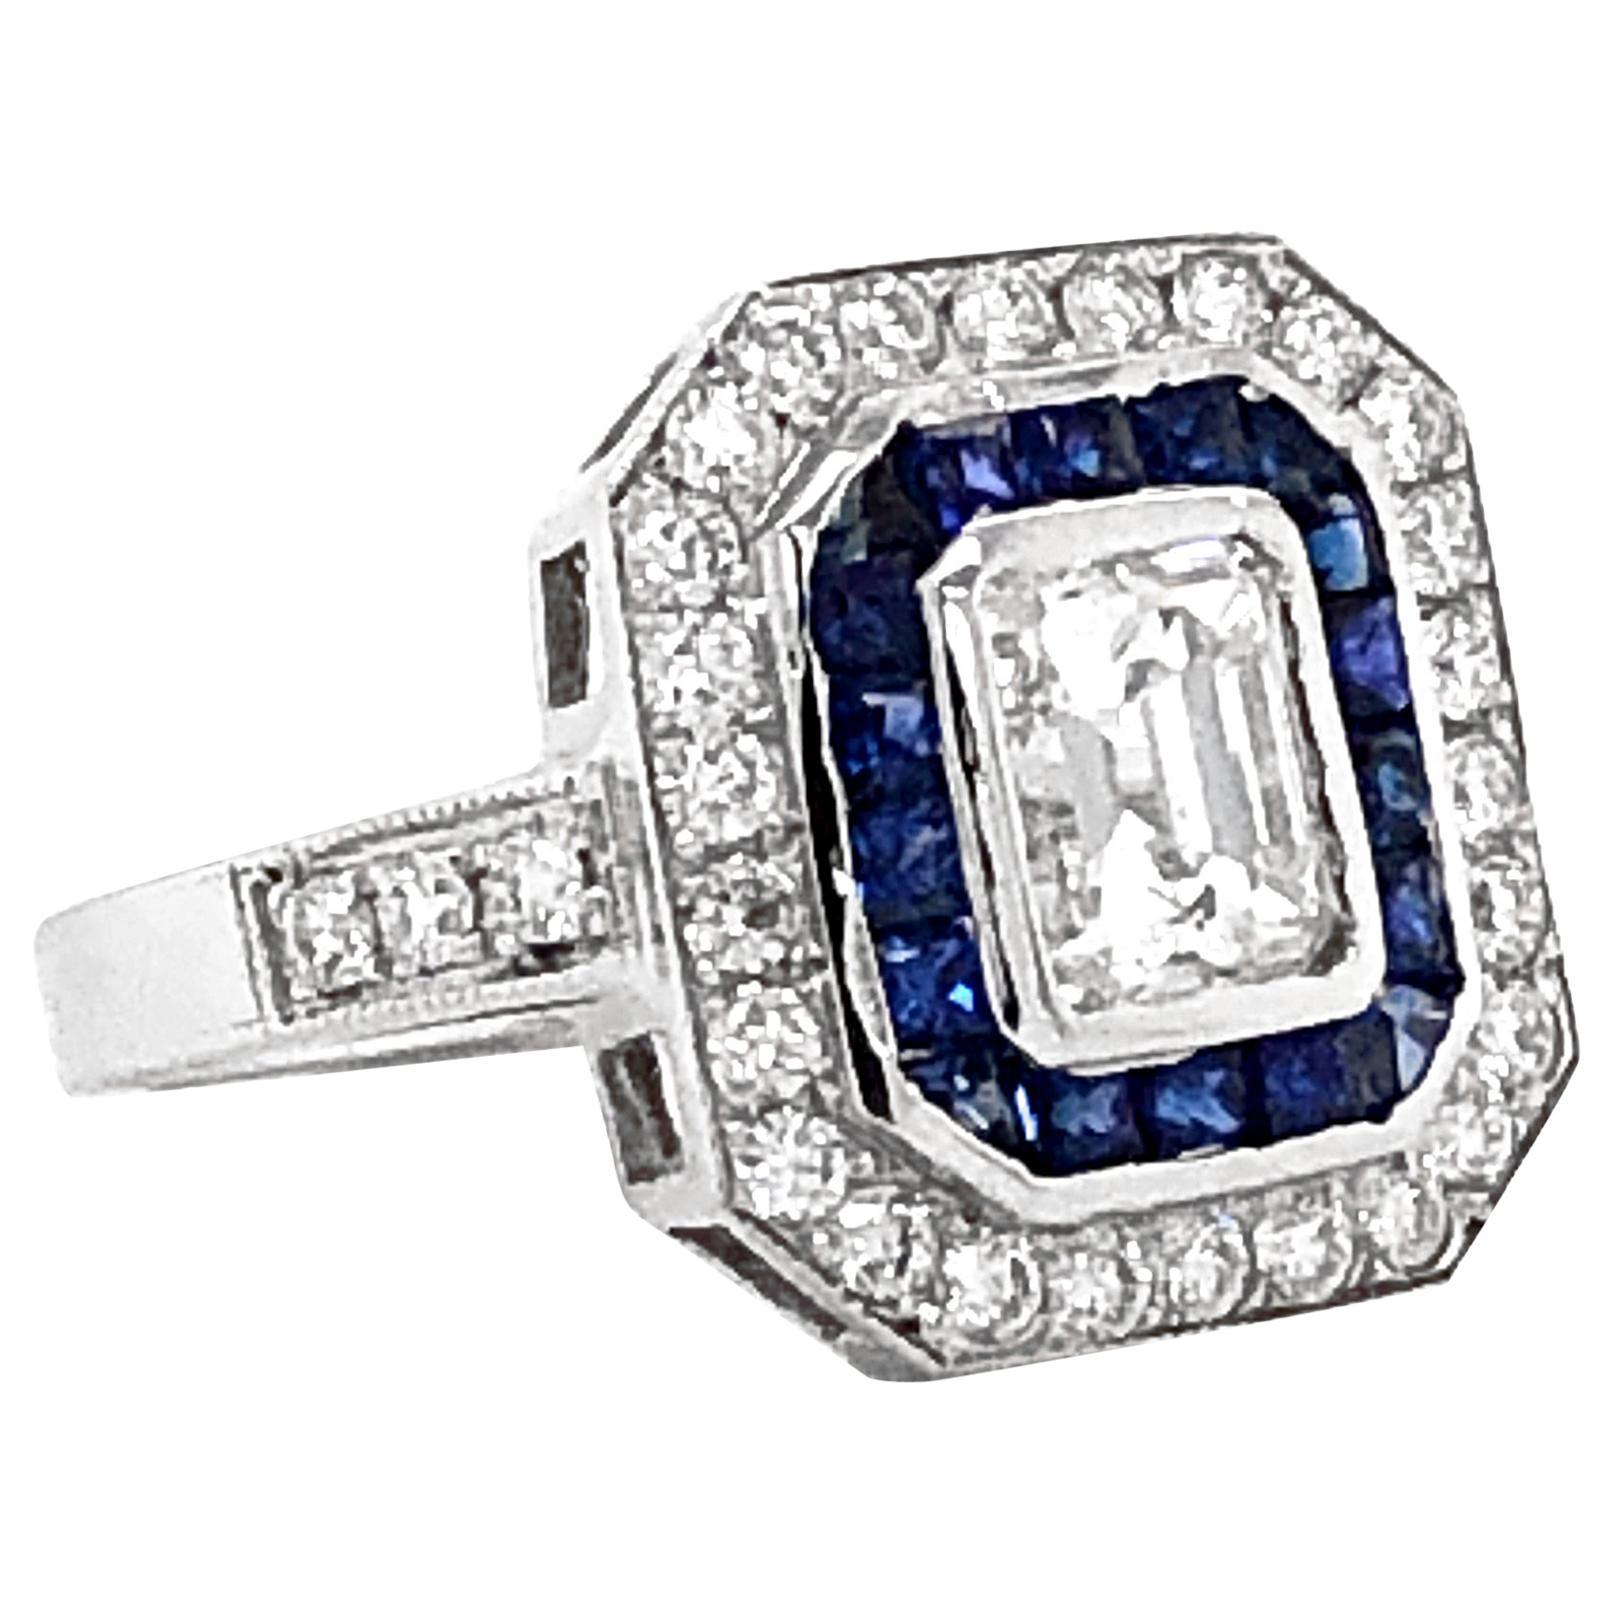 GIA Certified Emerald Cut Diamond 1.01 Carat Sapphires Diamonds Cocktail Ring